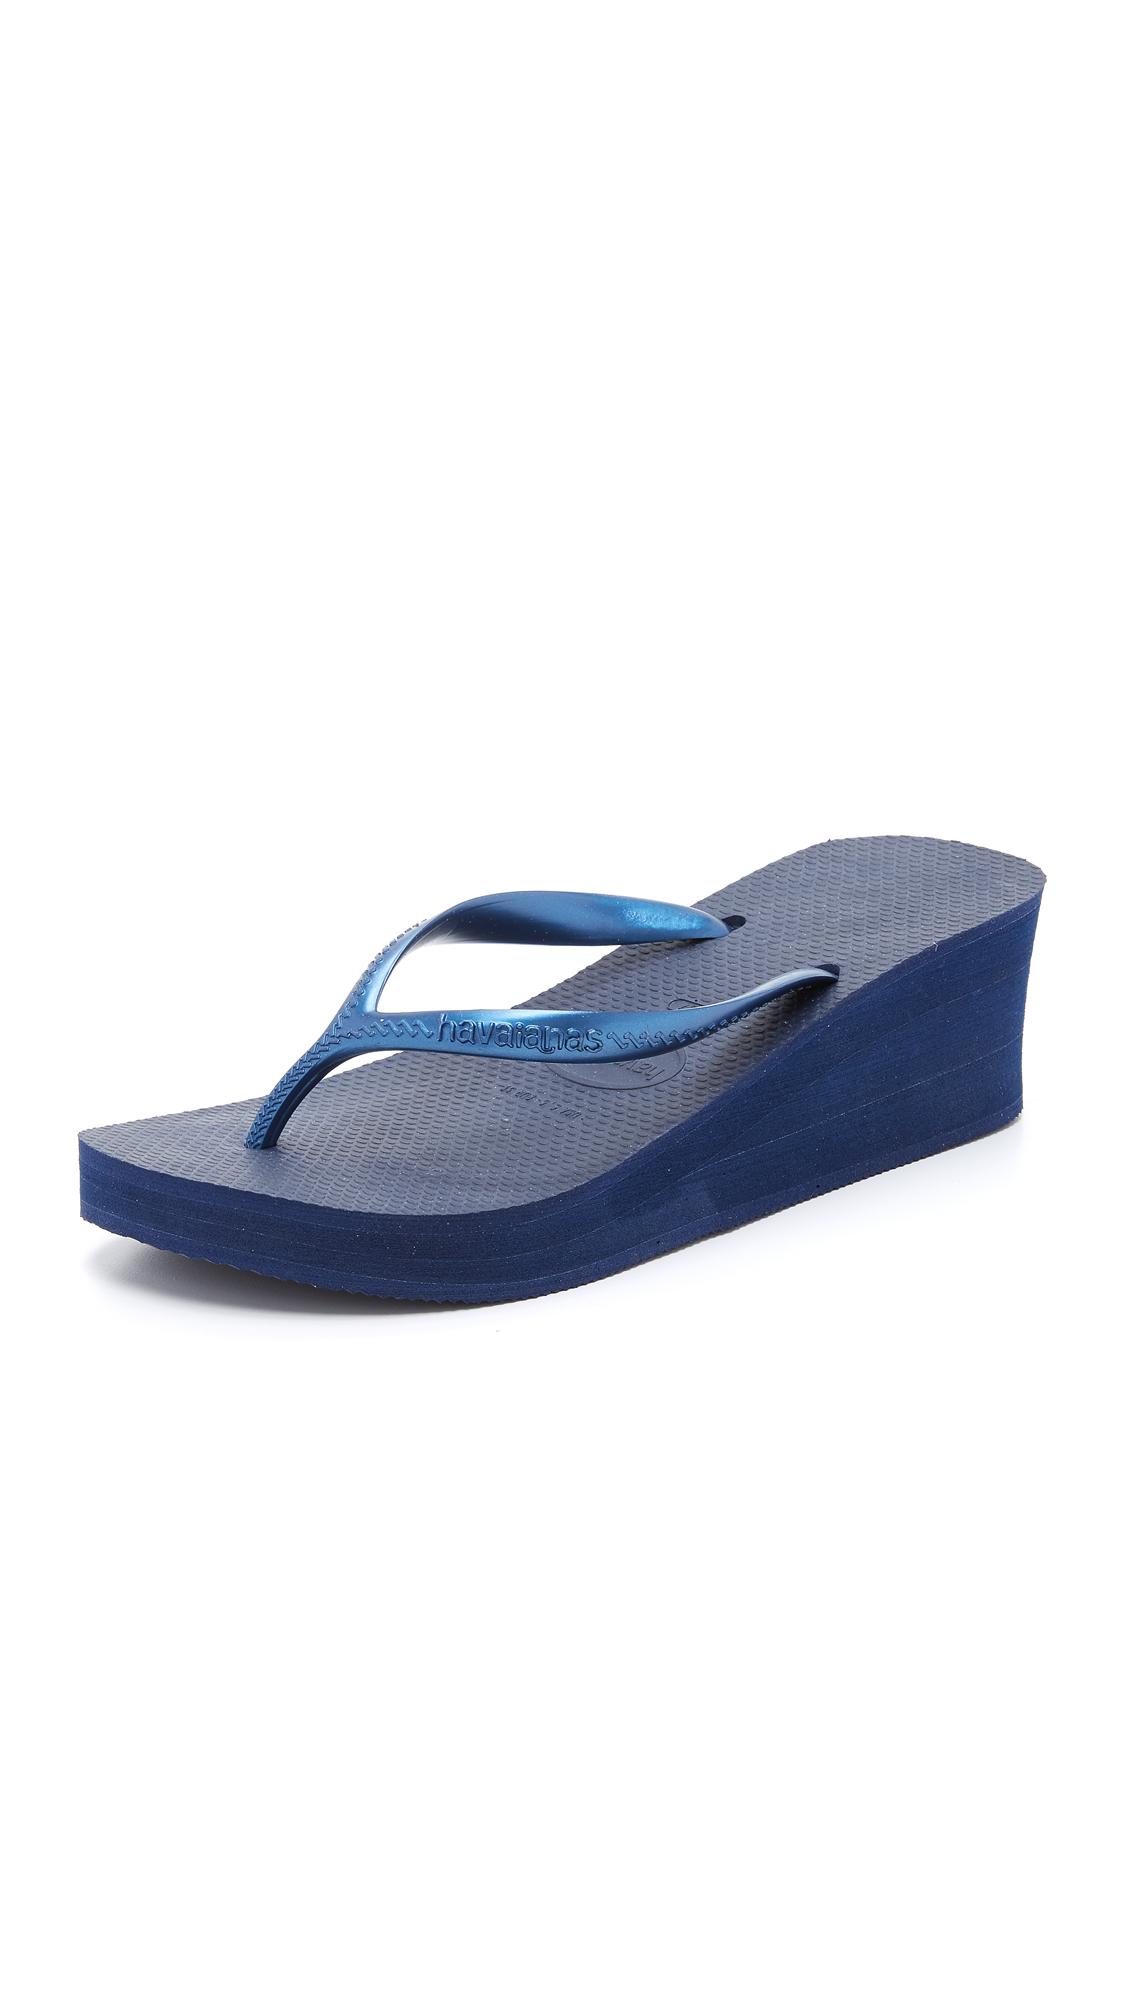 Havaianas High Fashion Wedge Sandals - Navy at Shopbop